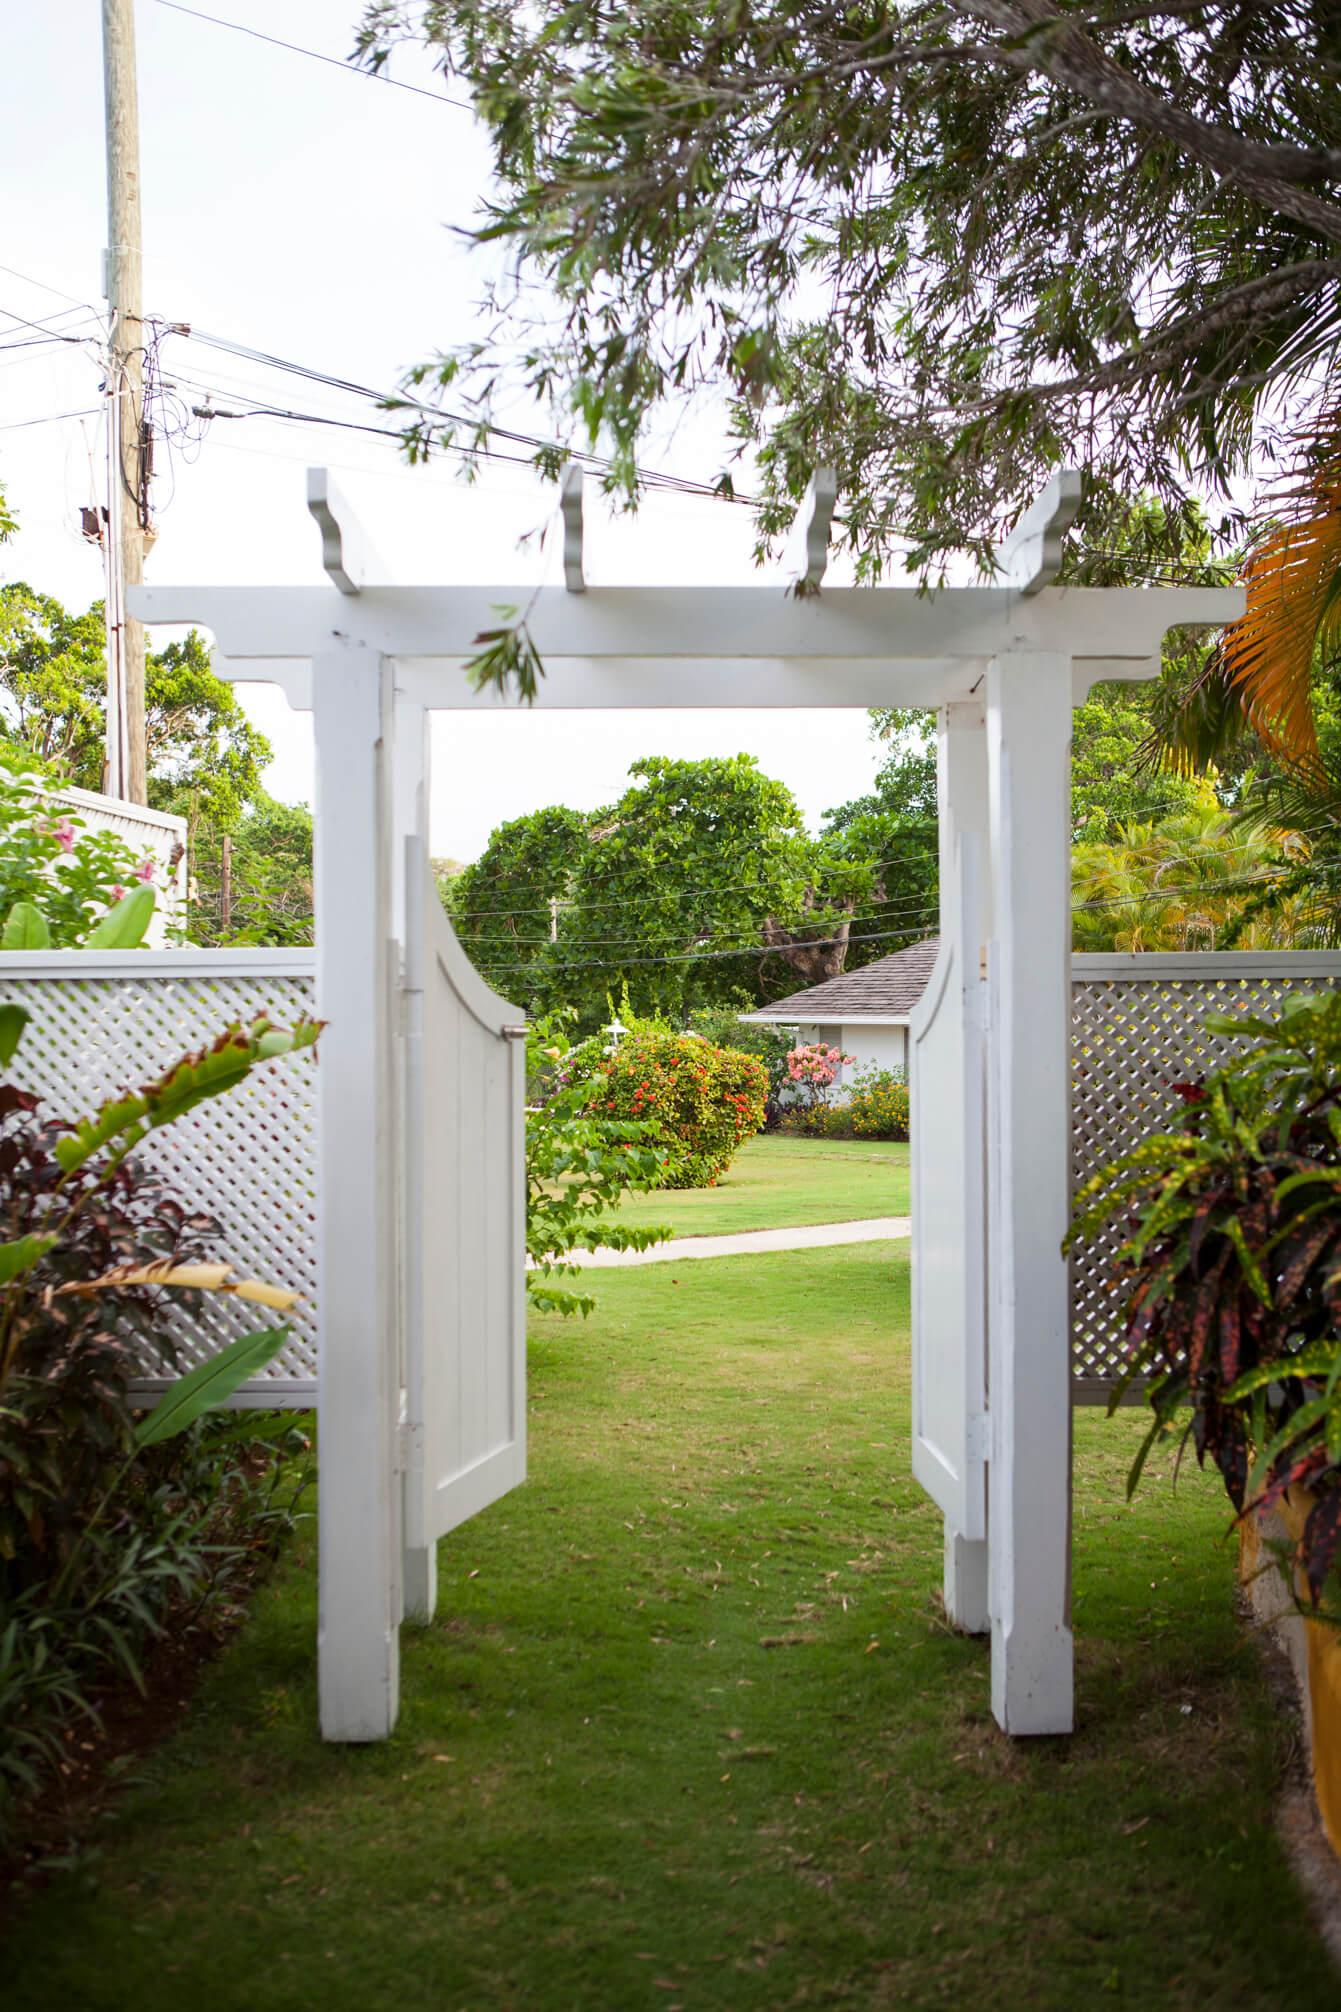 jamaica-inn-09.jpg